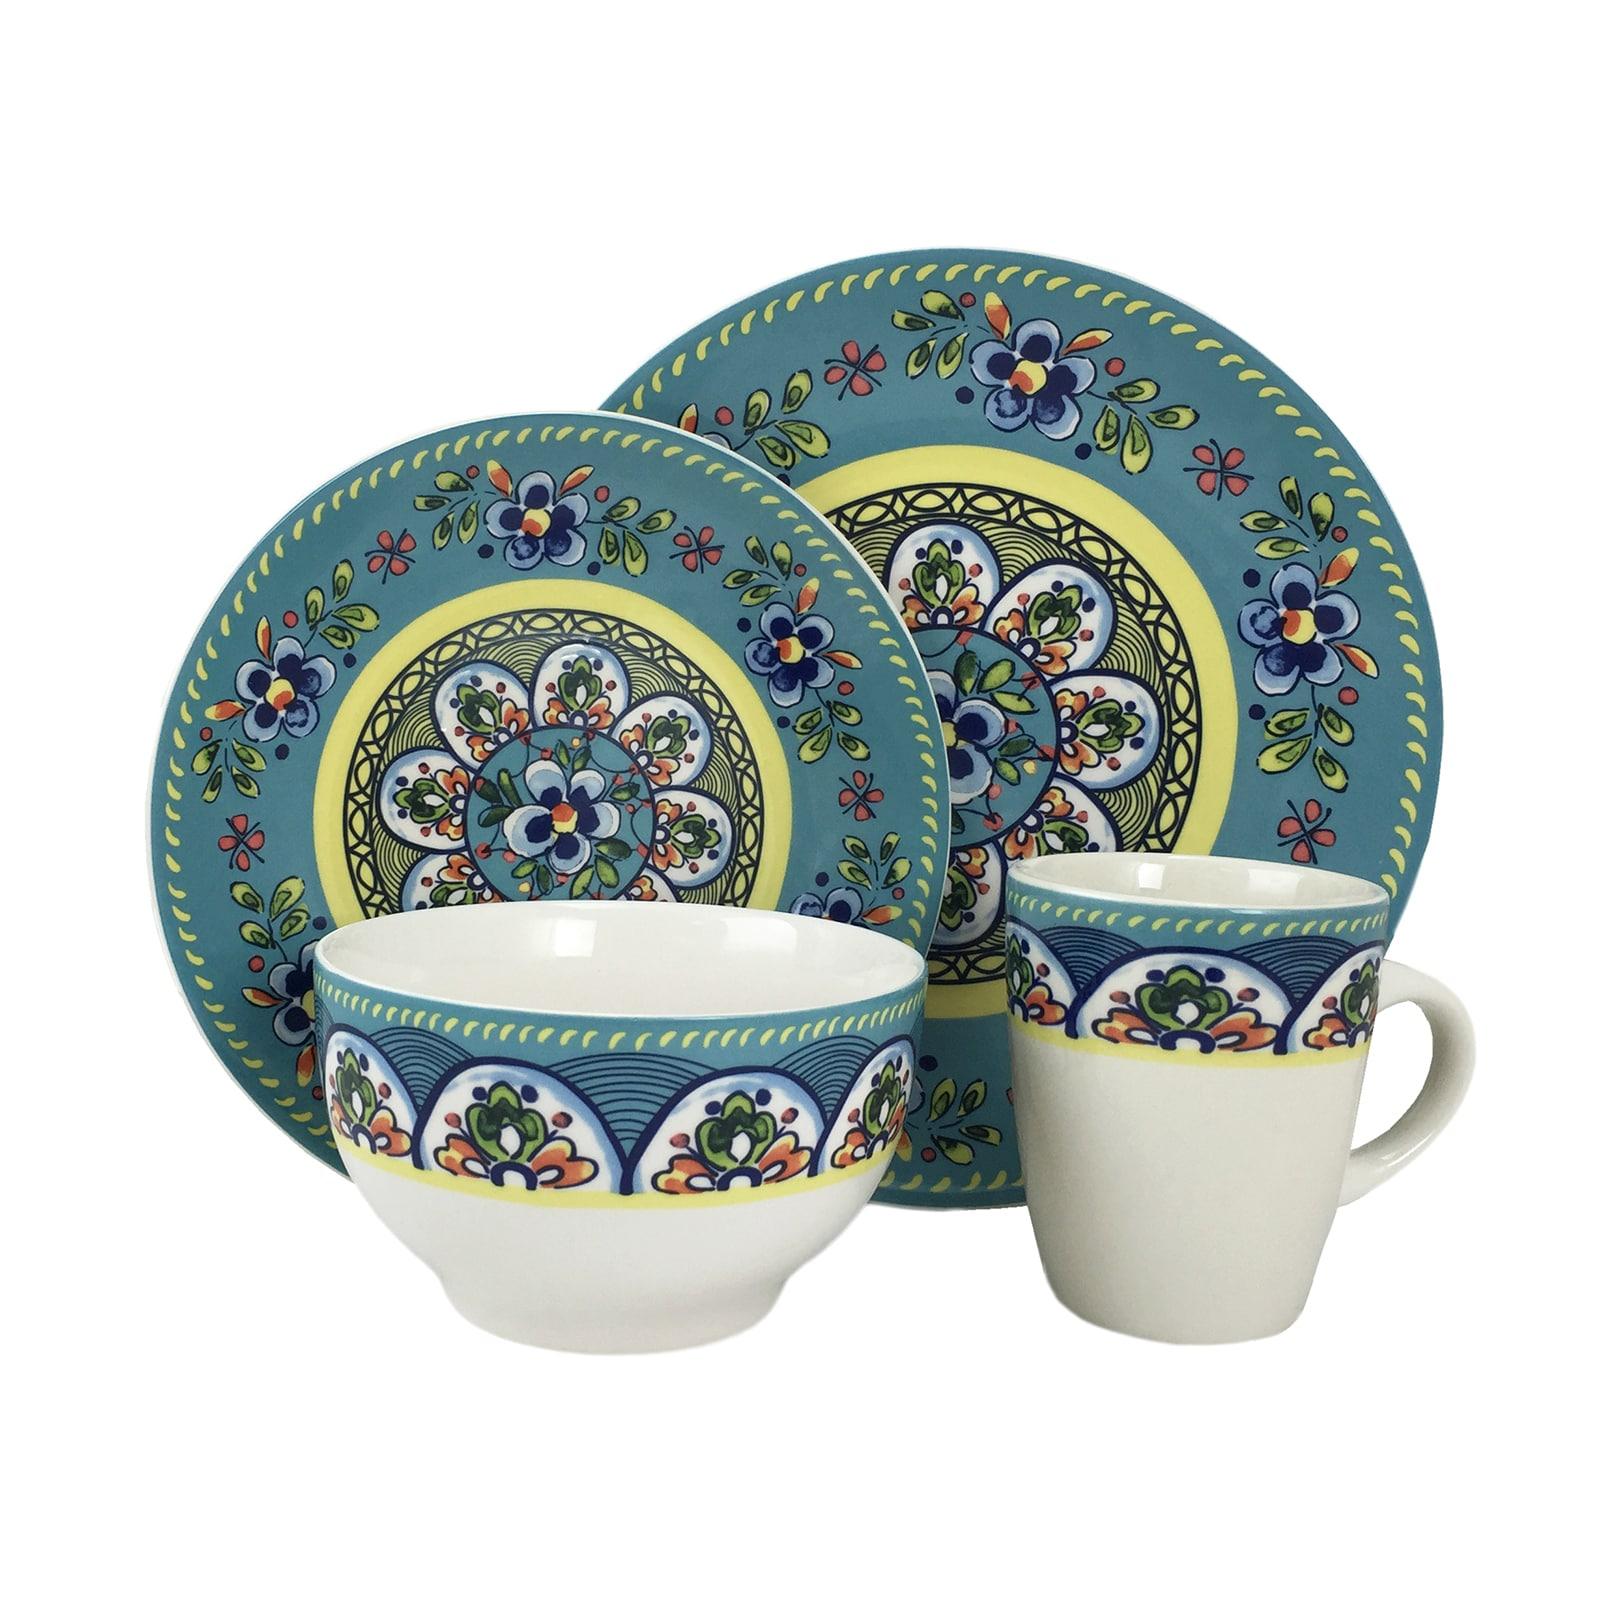 Elama Santa Fe Springs Multicolored Stoneware 16-piece Dinnerware Set - Free Shipping Today - Overstock - 19737094  sc 1 st  Overstock.com & Elama Santa Fe Springs Multicolored Stoneware 16-piece Dinnerware ...